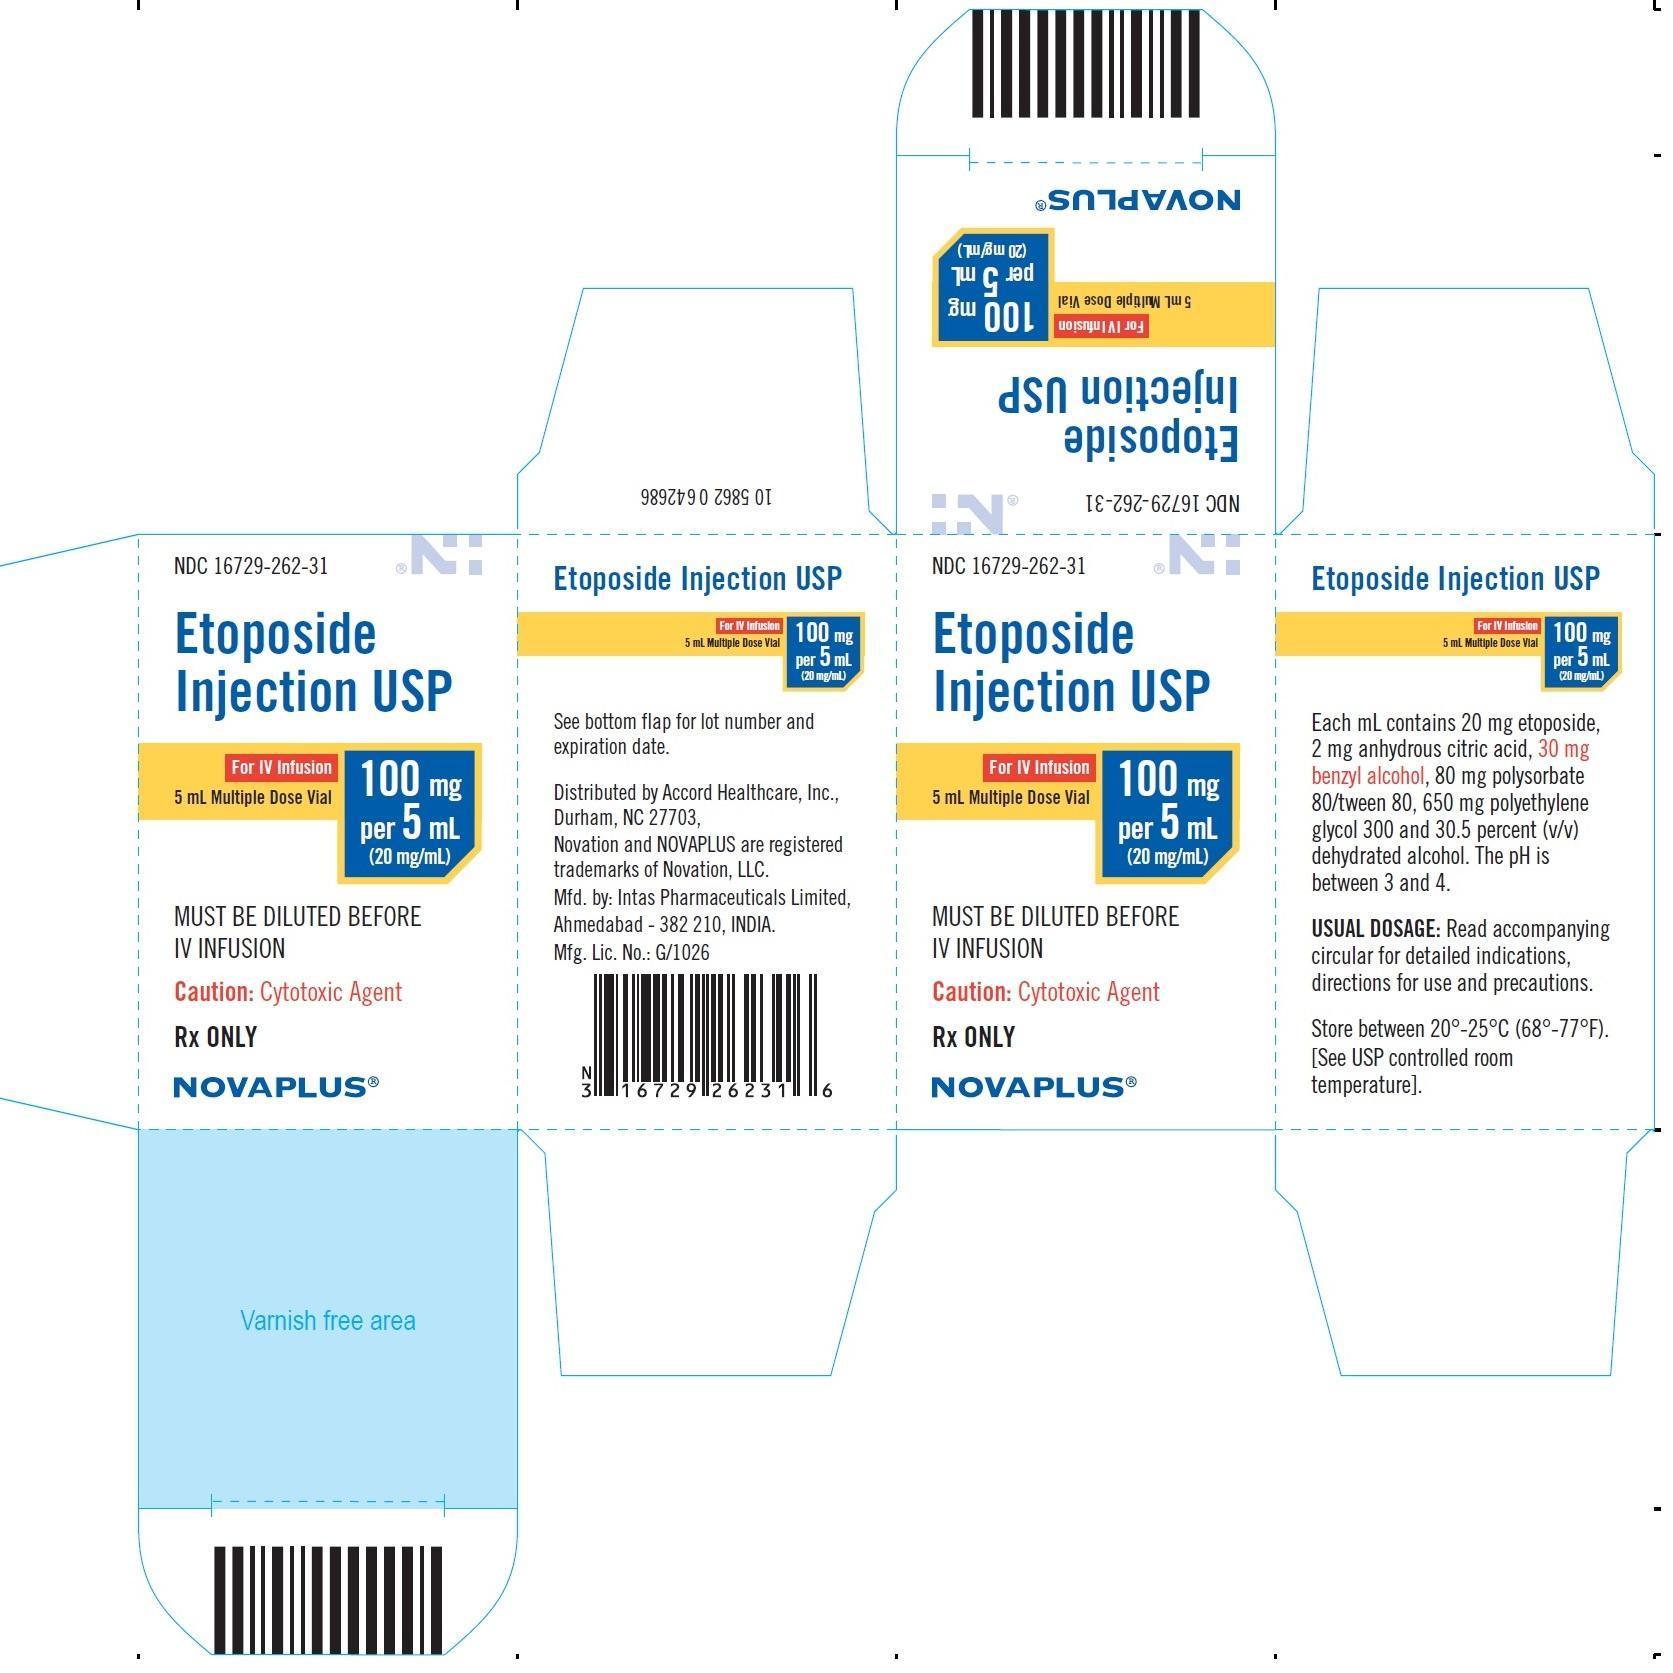 5ml carton label